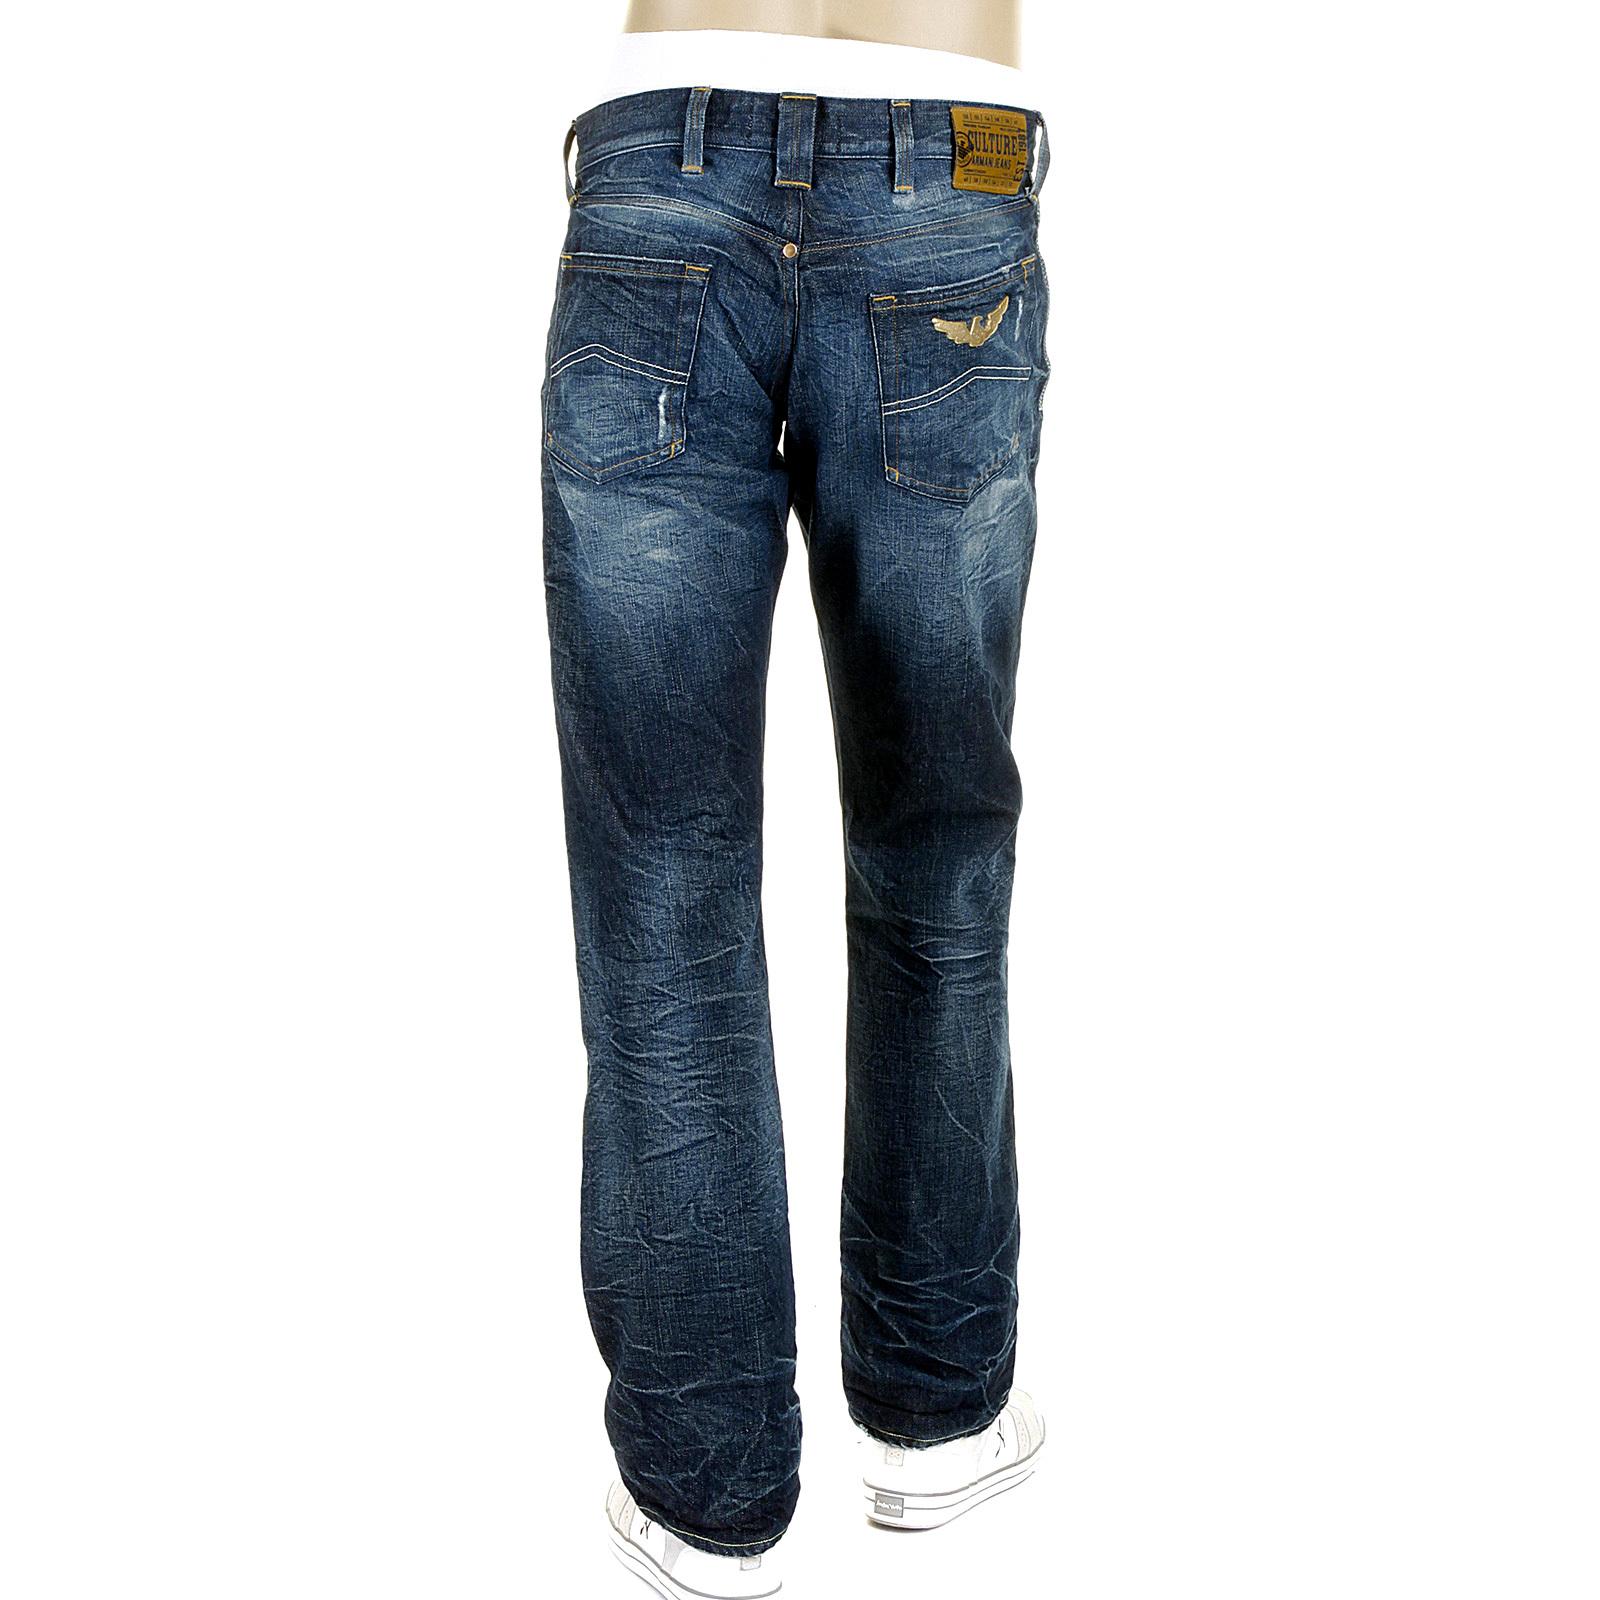 Jeans Armani Jeans J25 Japanese denim jeans special ...